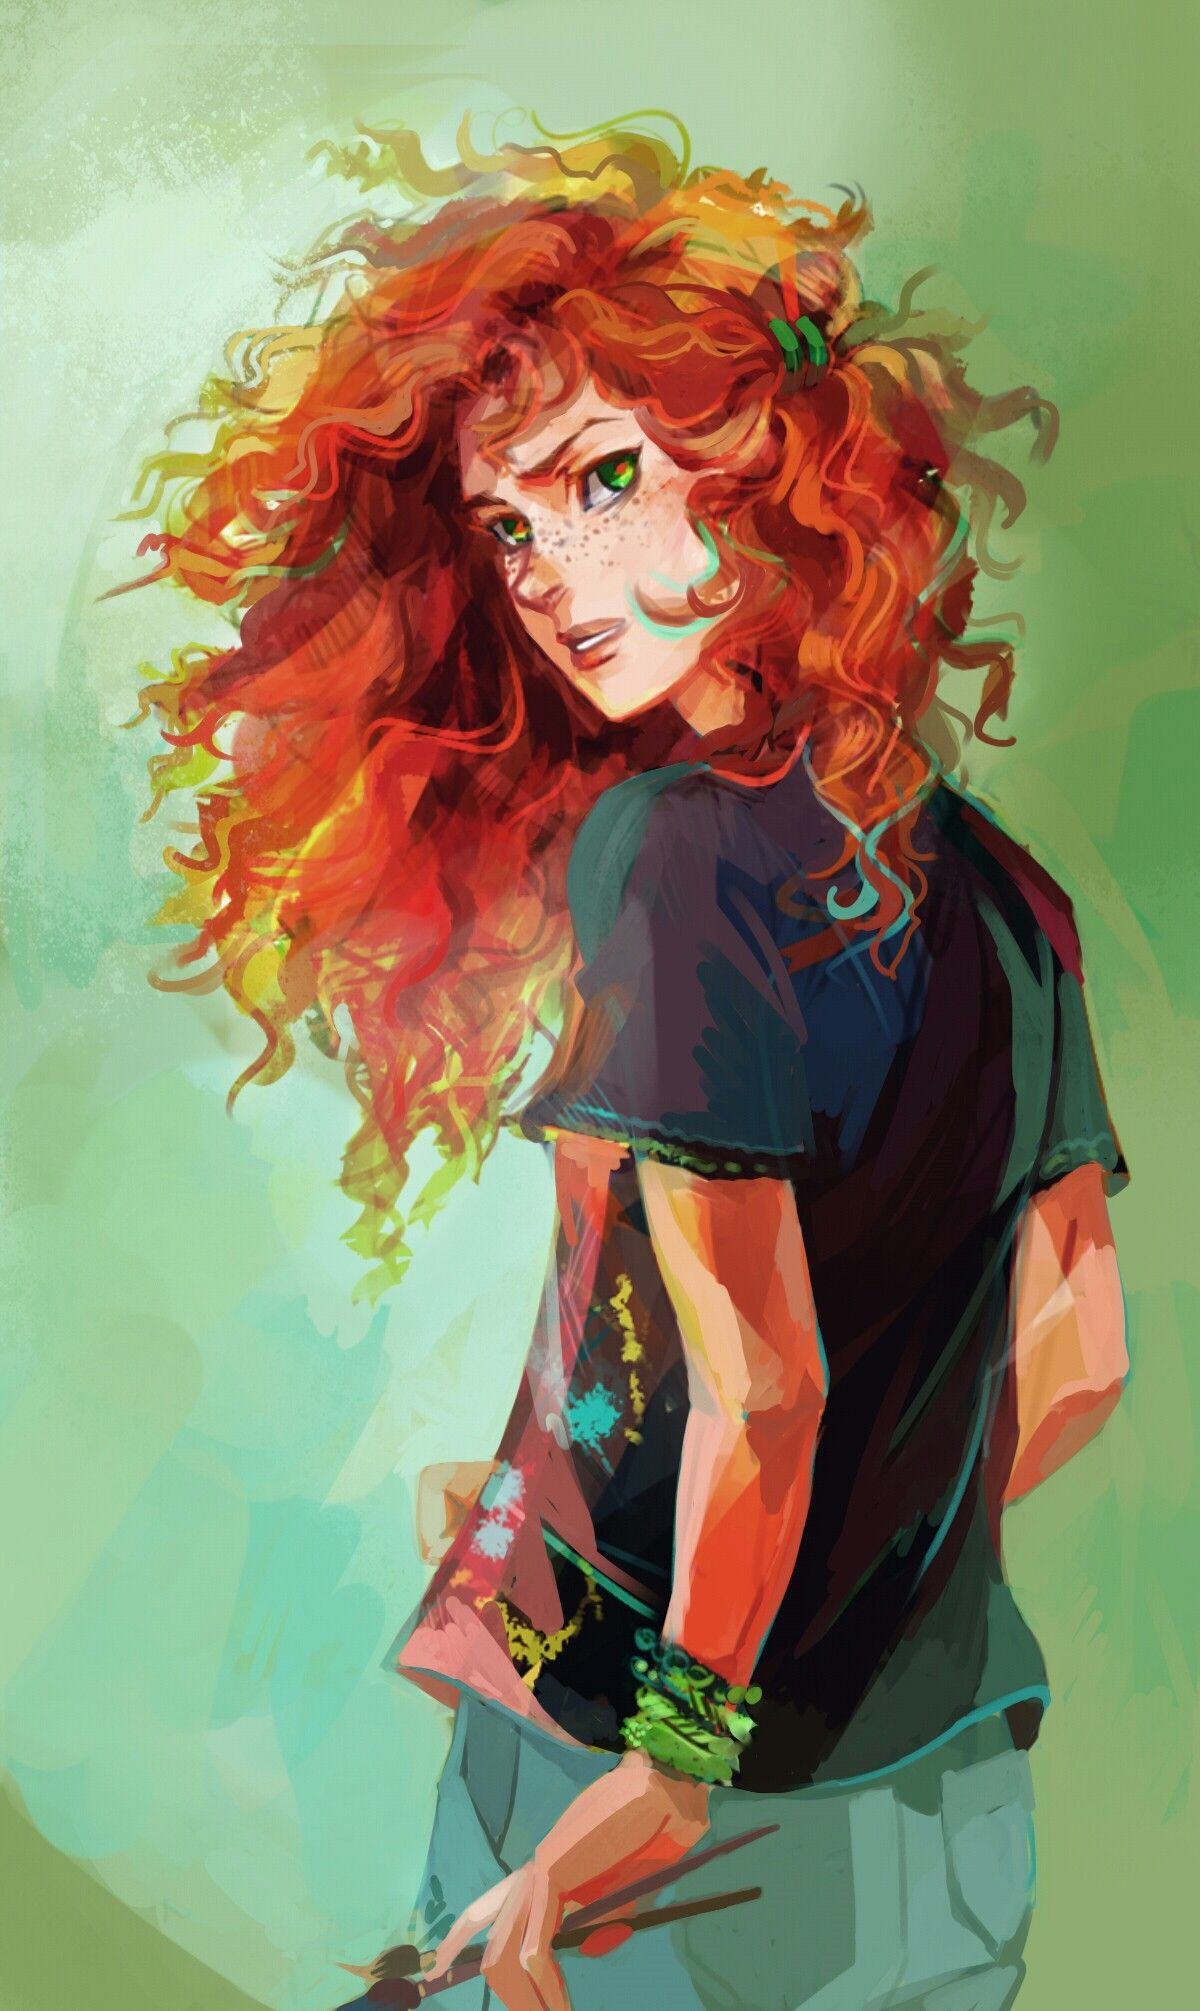 Rachel Elizabeth Dare. Artwork by Viktoria Ridzel/Viria for Rick ...